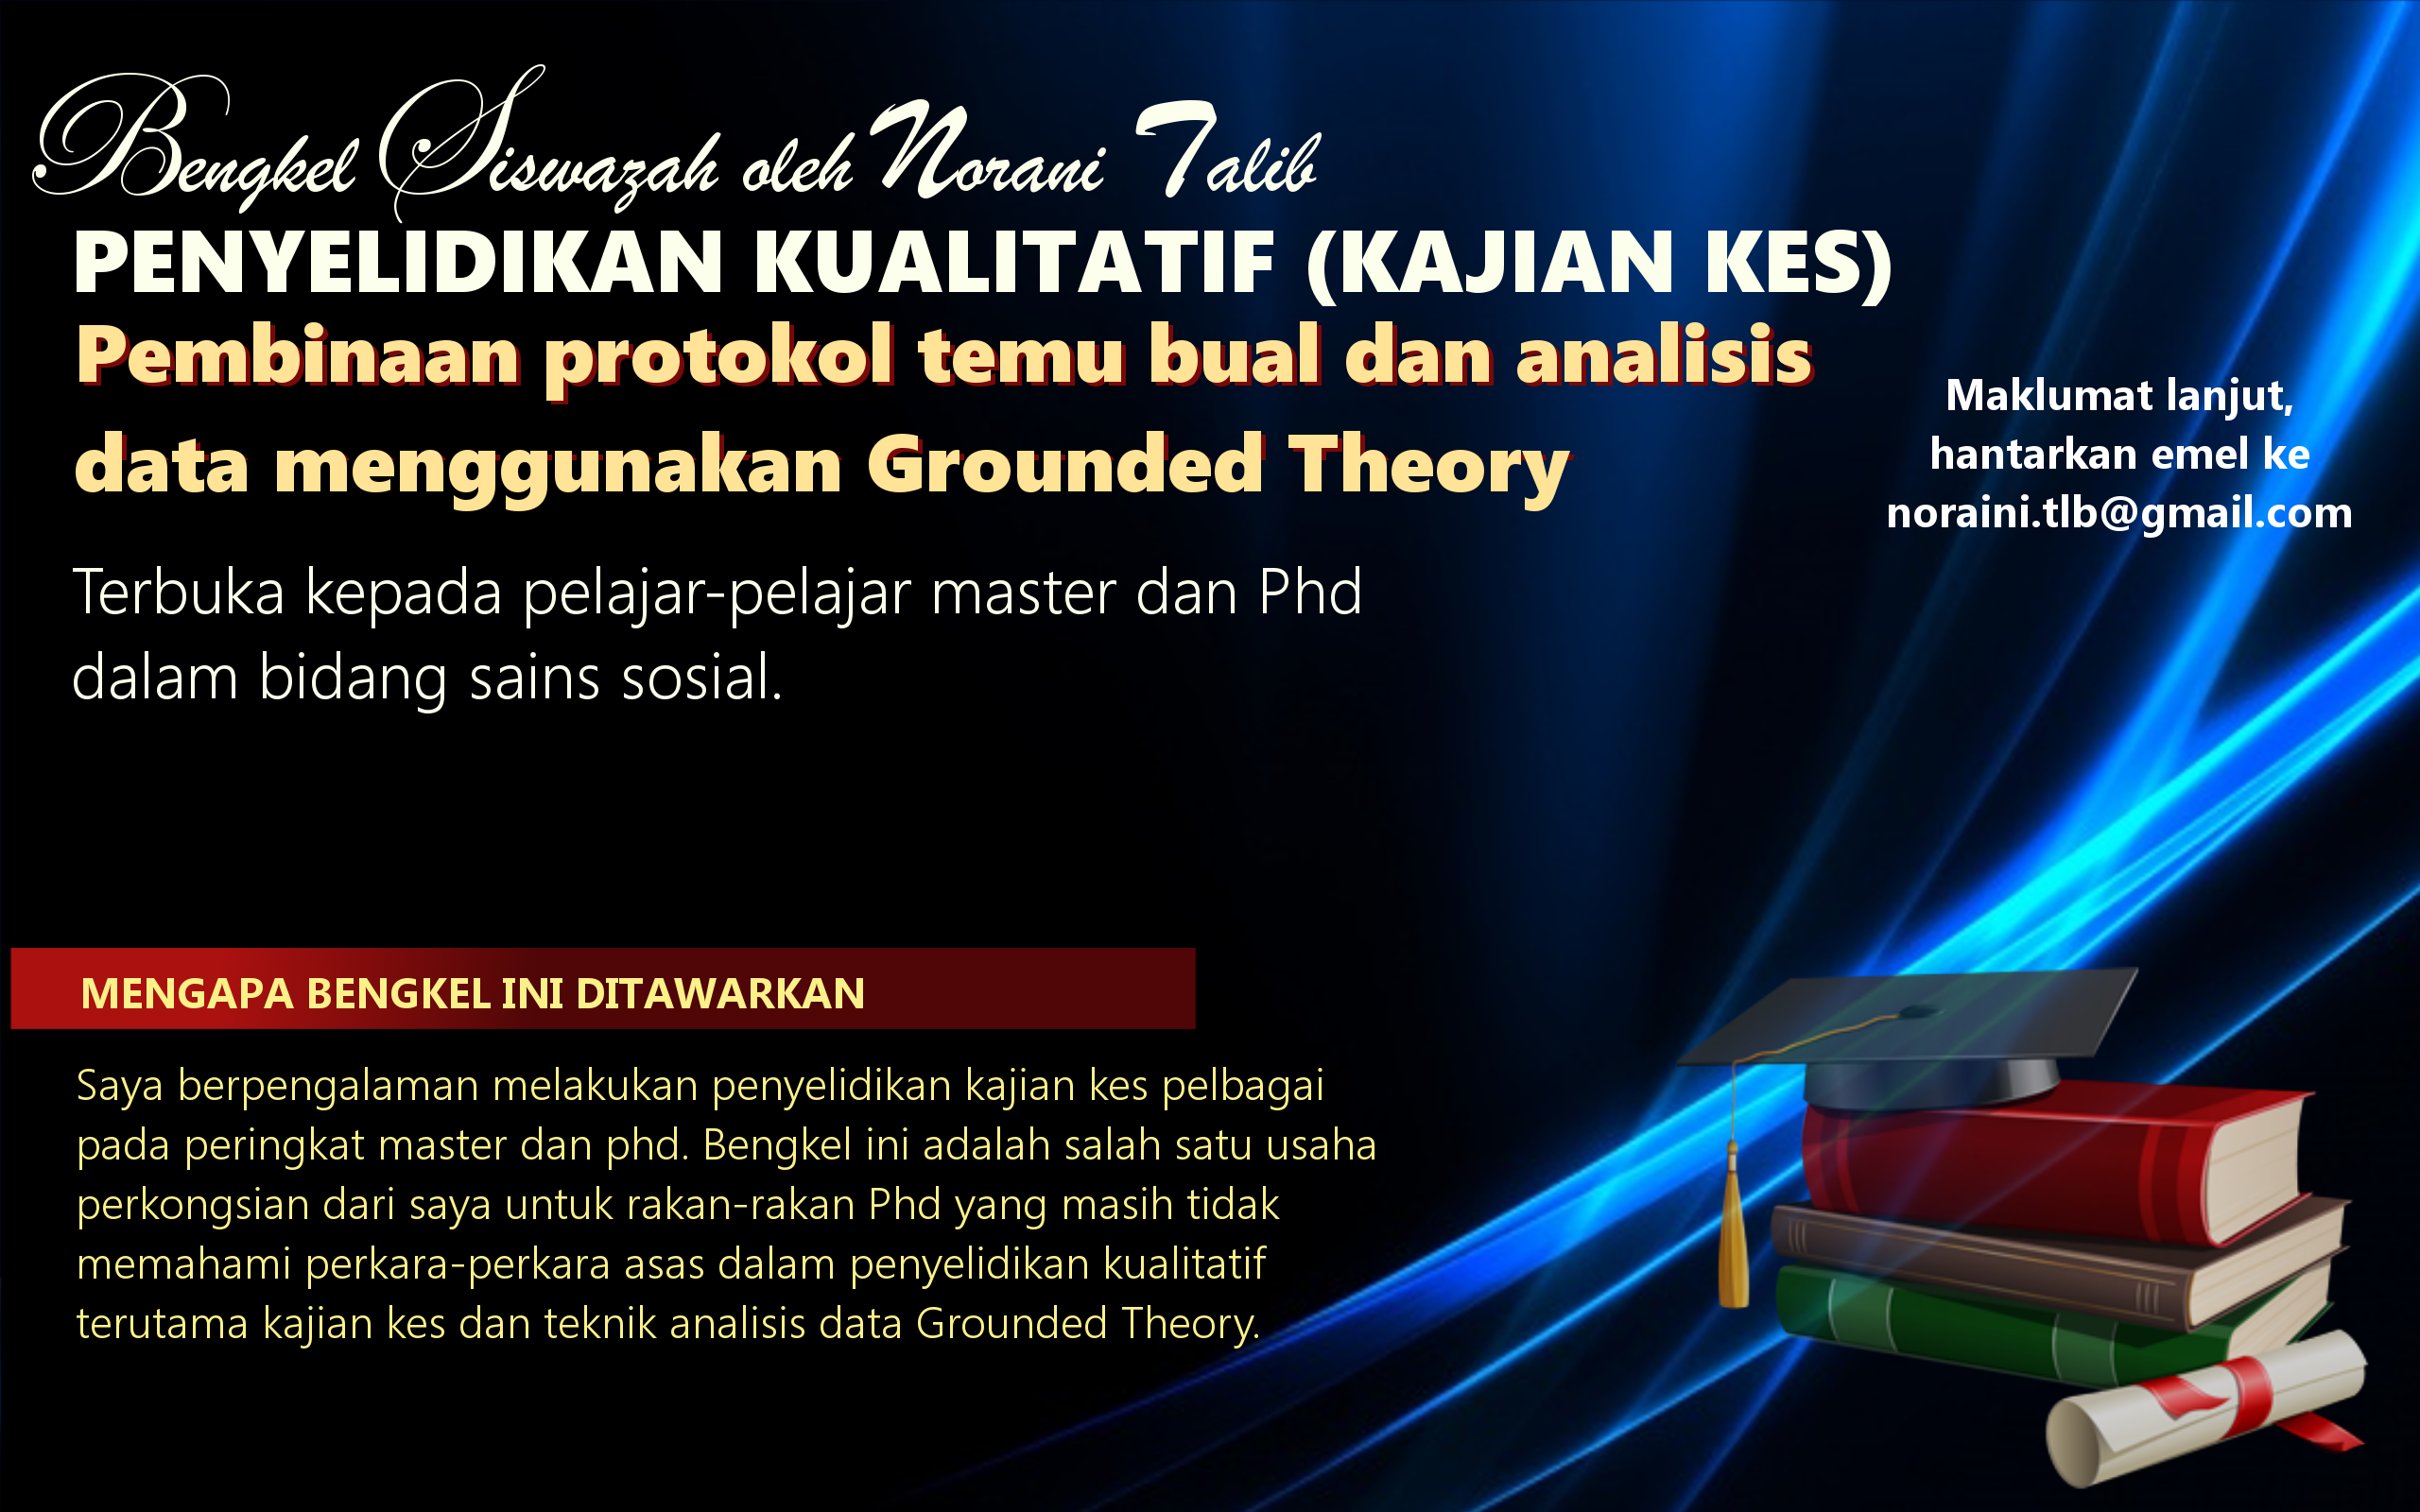 Kursus Kualitatif Grounded Theory